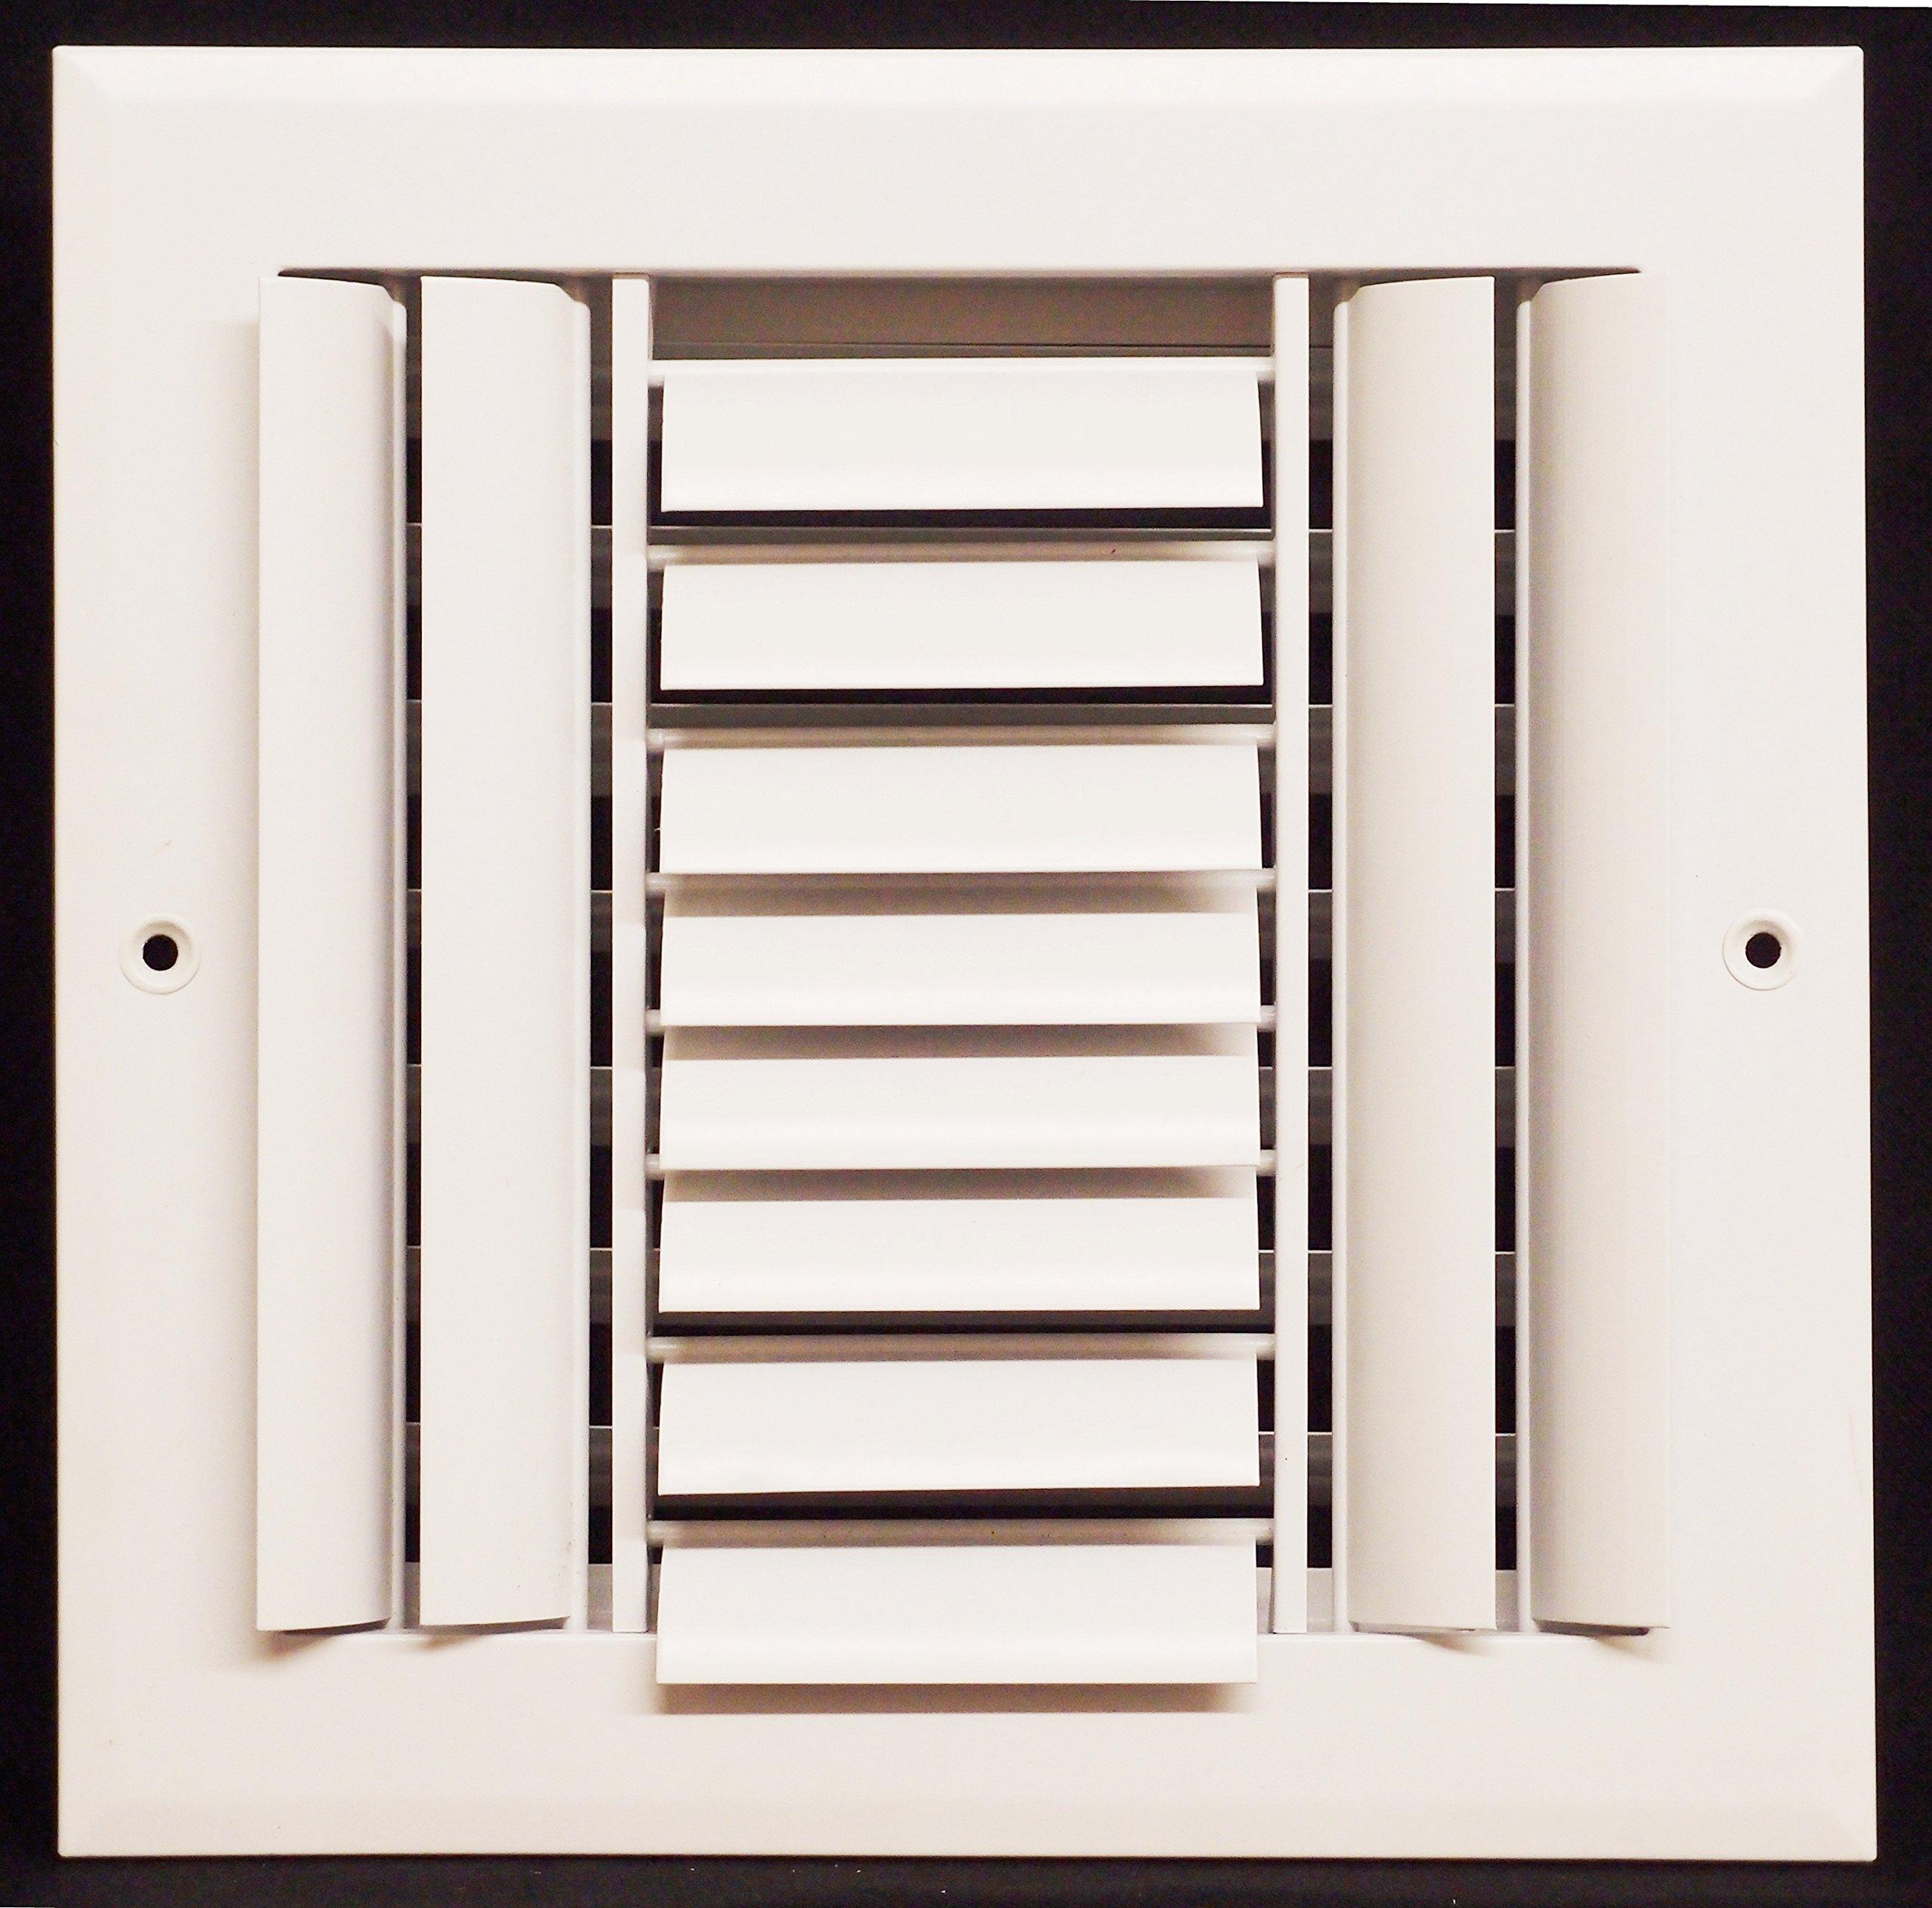 10'' x 10'' - 3-Way Air Vent - Adjustable Aluminum Curved Blades - Maximum Air Flow - HVAC Grille